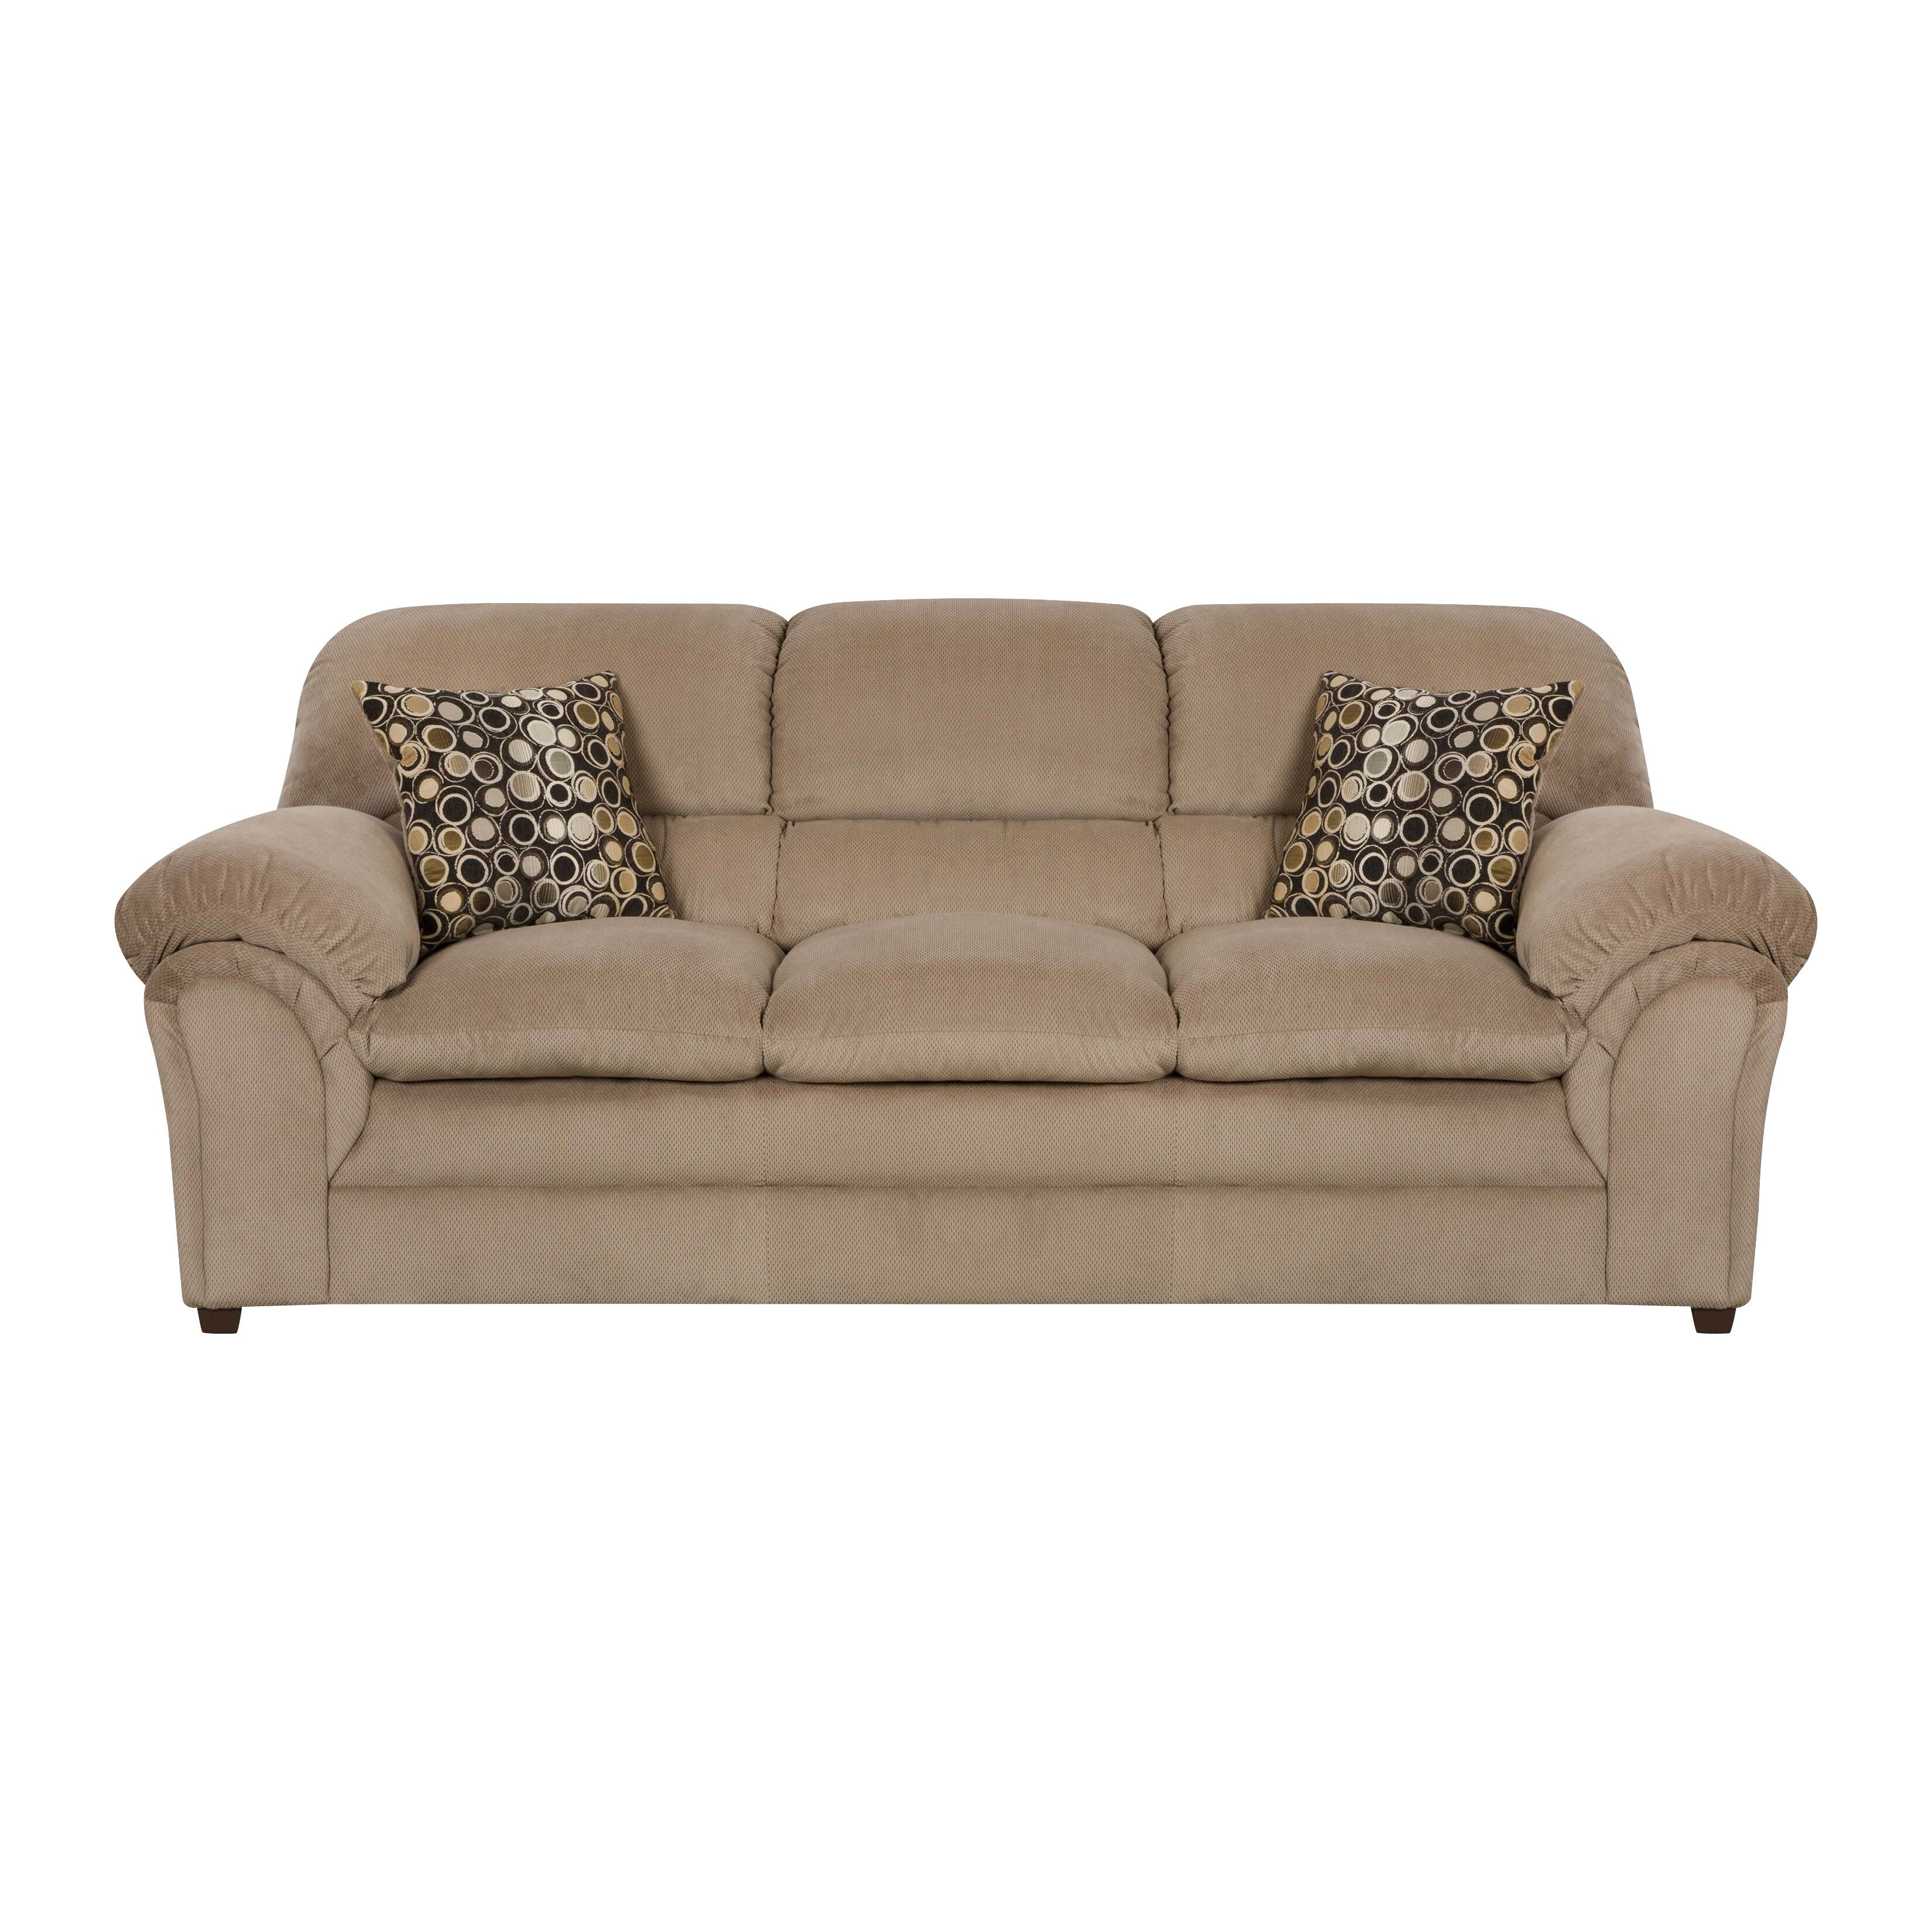 Simmons upholstery harper sofa reviews wayfair for Sofa upholstery